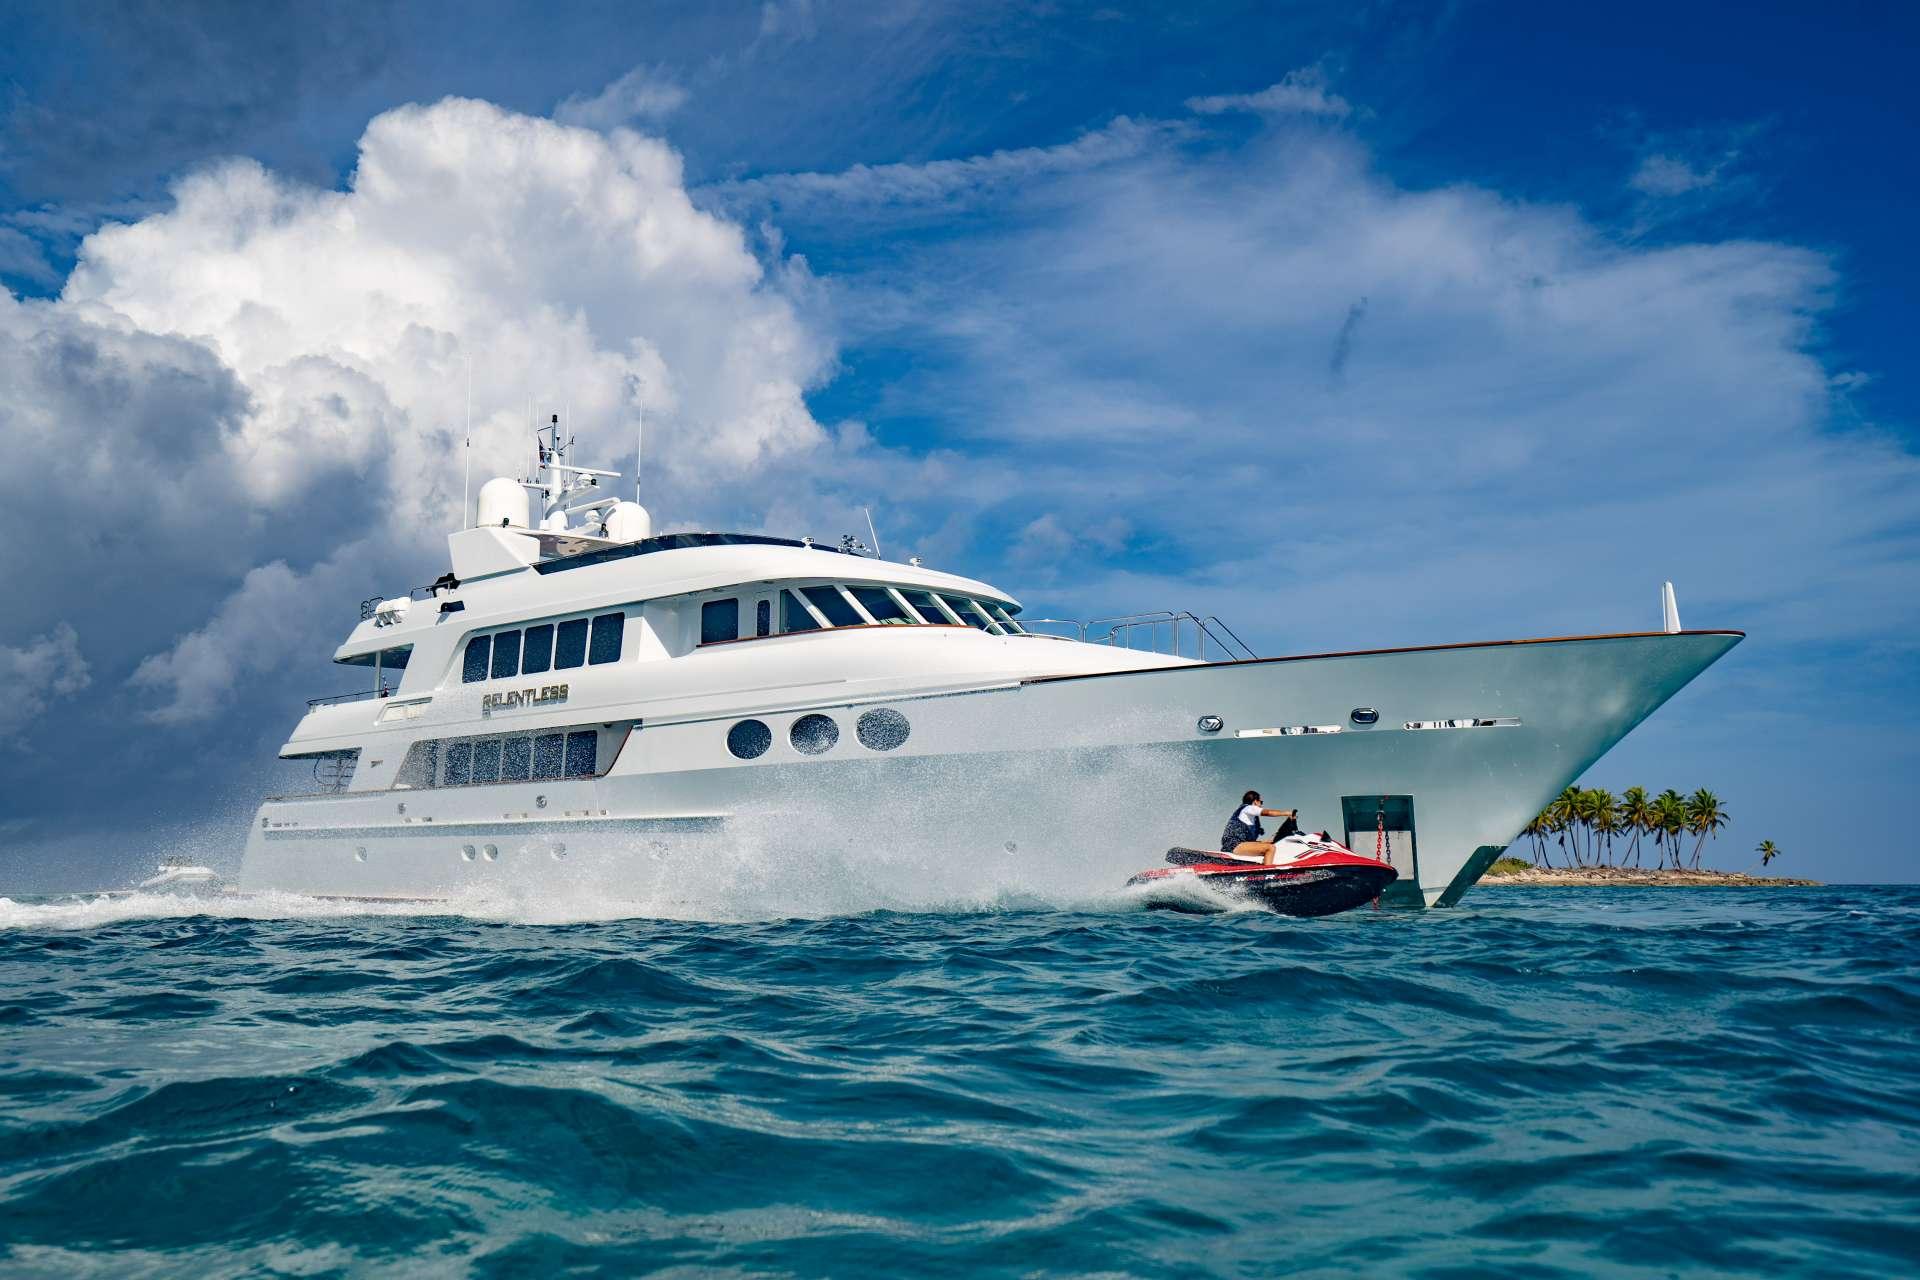 Main image of RELENTLESS yacht